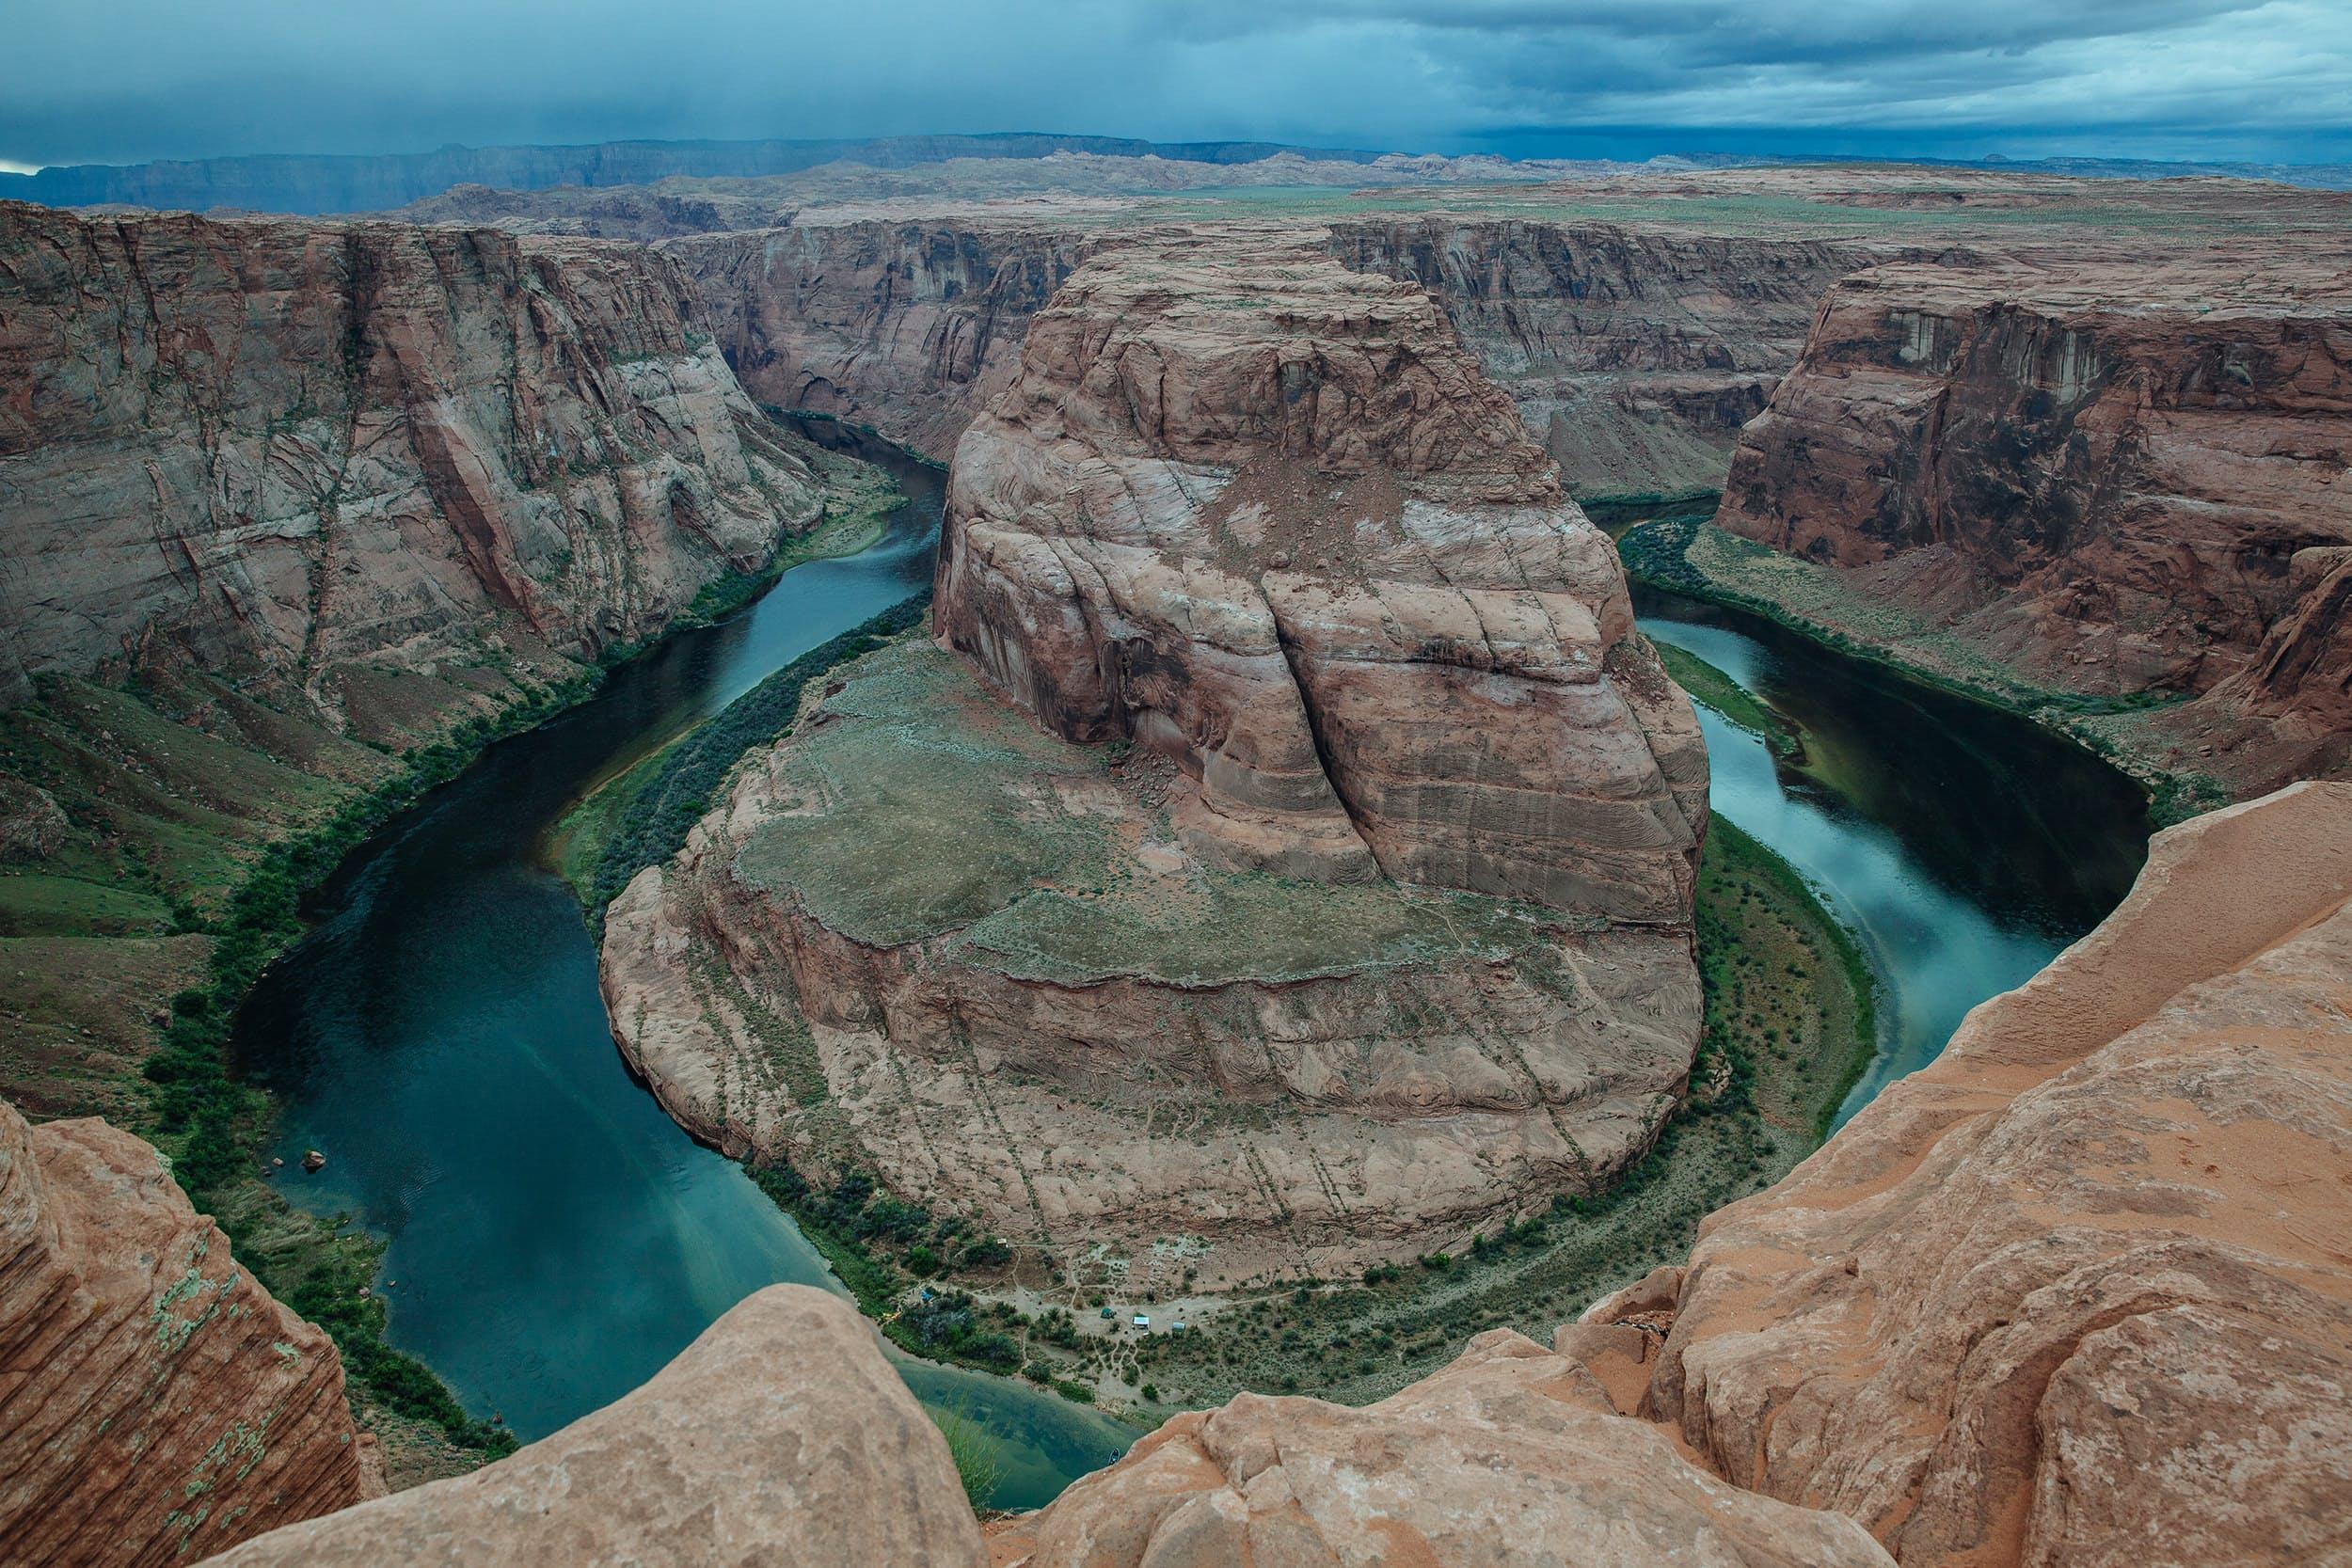 Huckberry grand canyon national park kylie turley horseshoe bend visit image.jpg?ixlib=rails 2.1